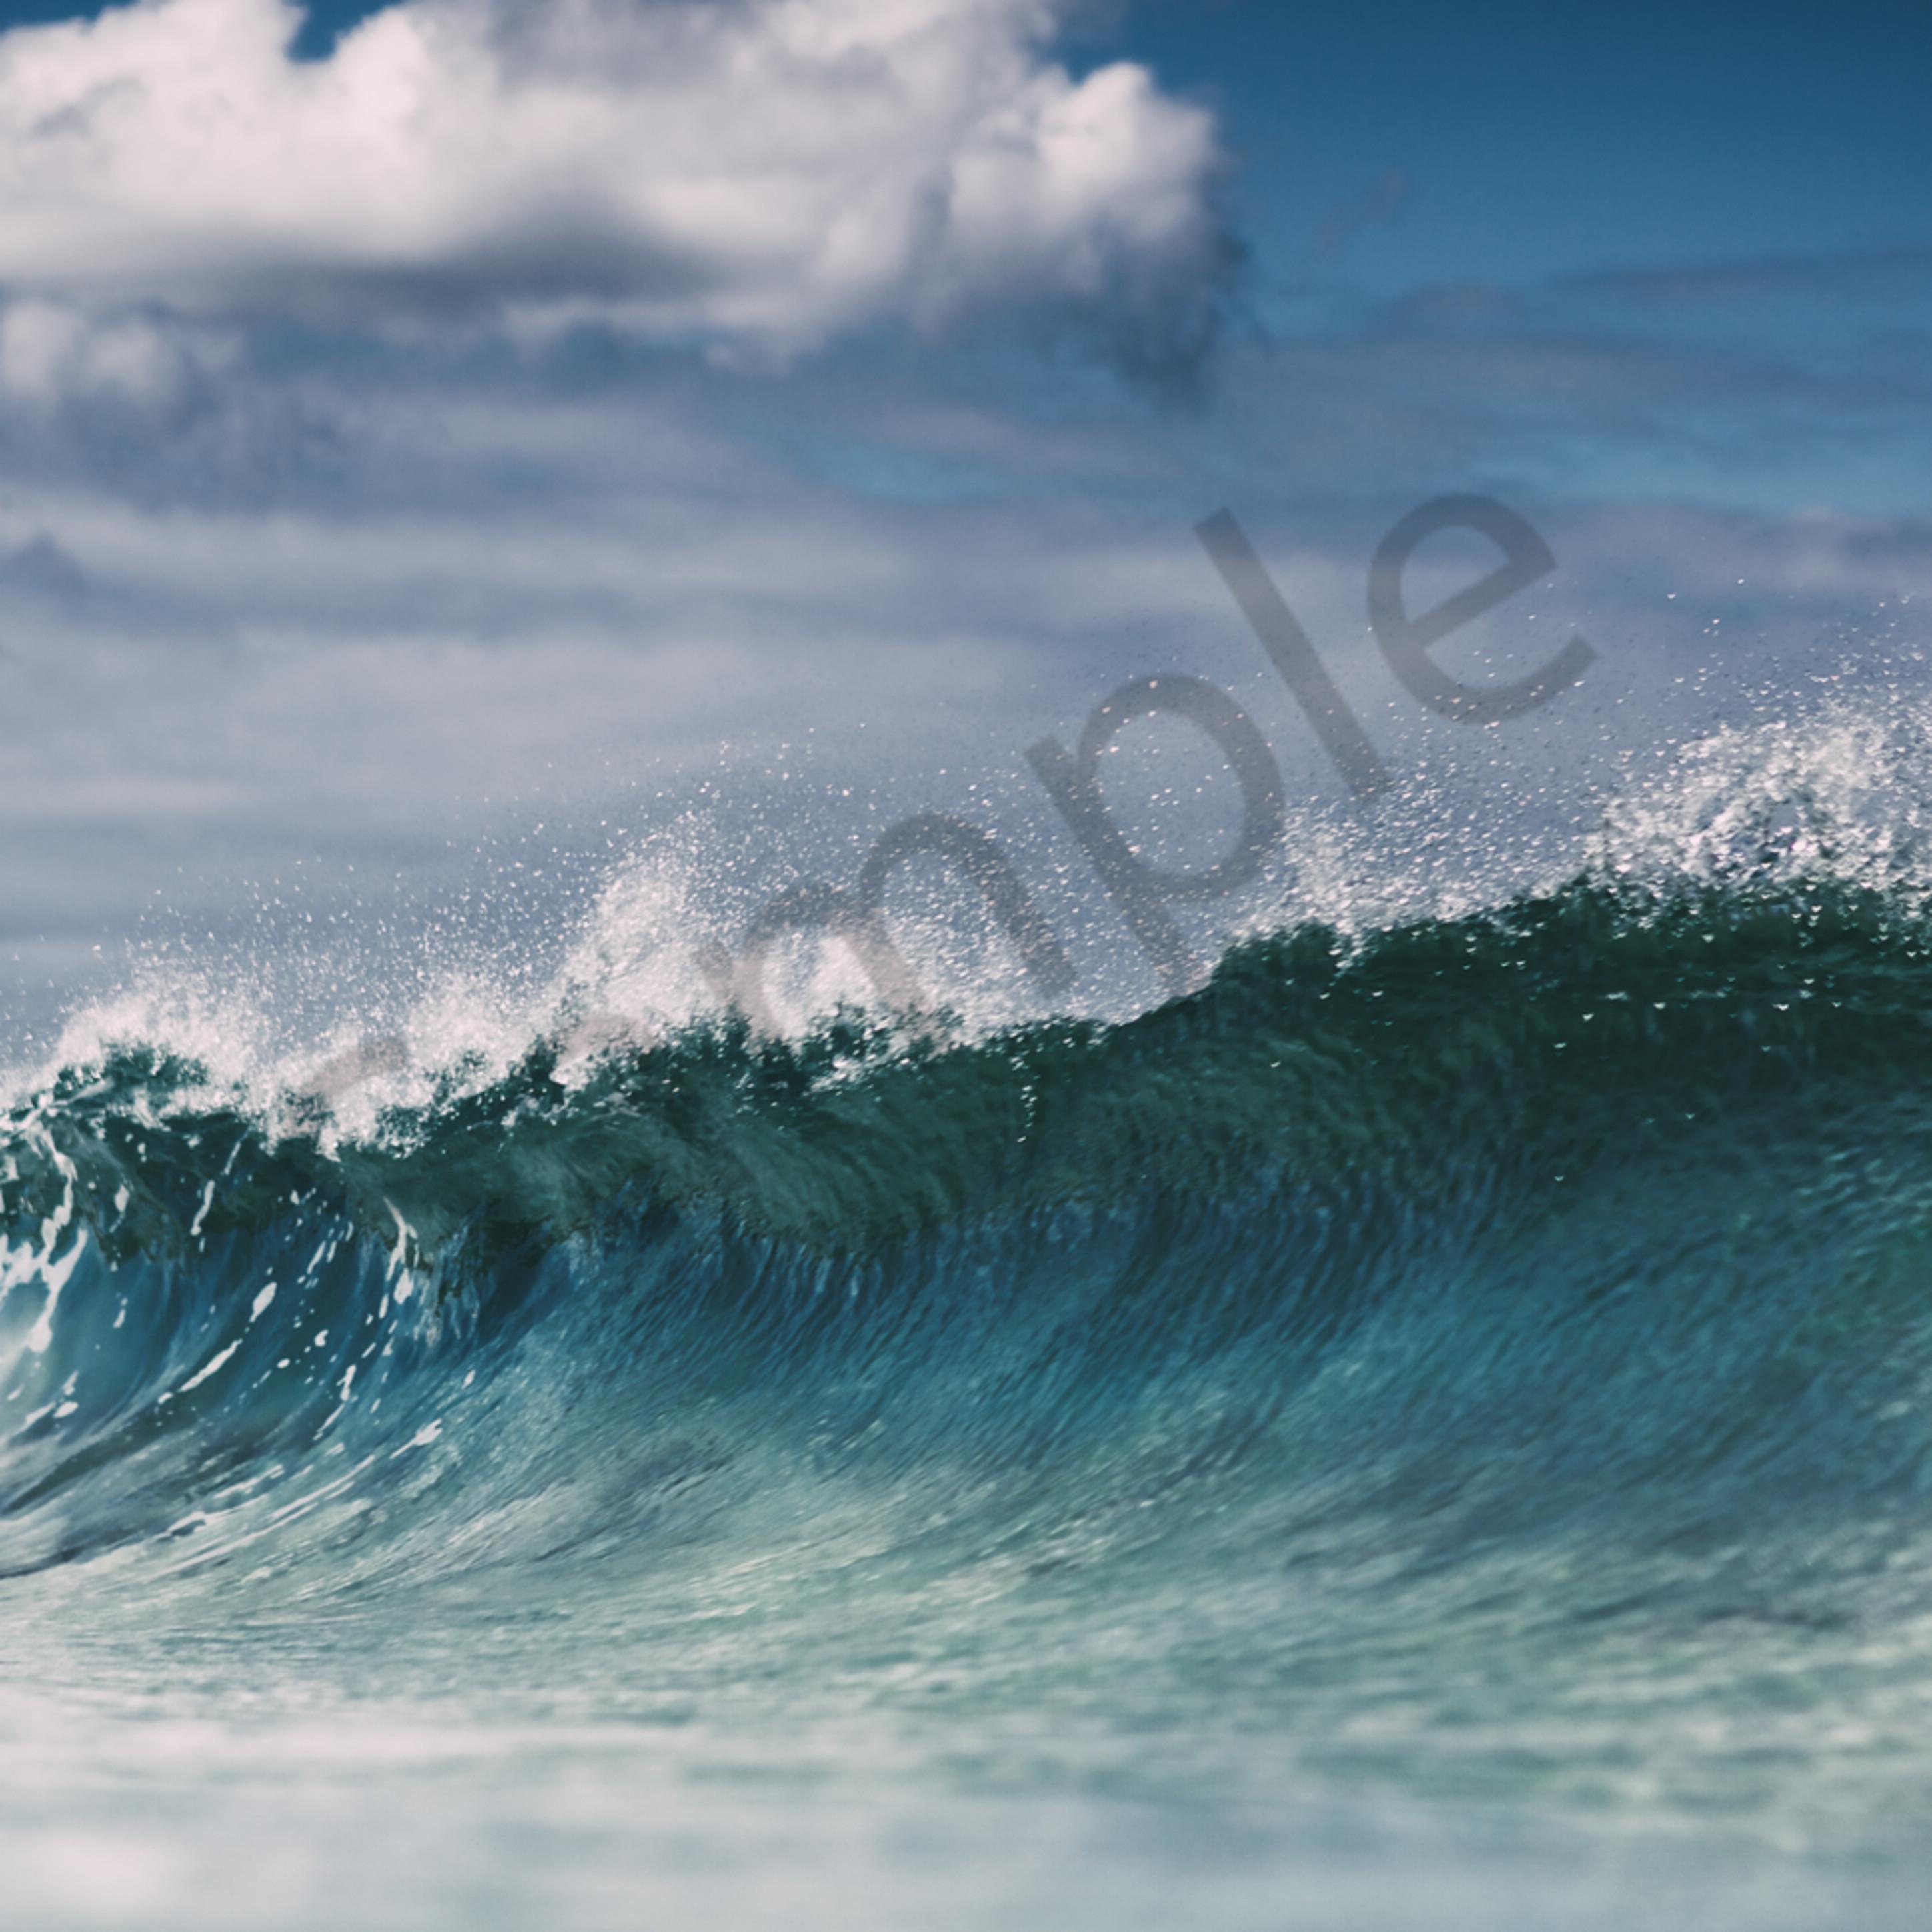 Wave makapuu 3 zzbvjr